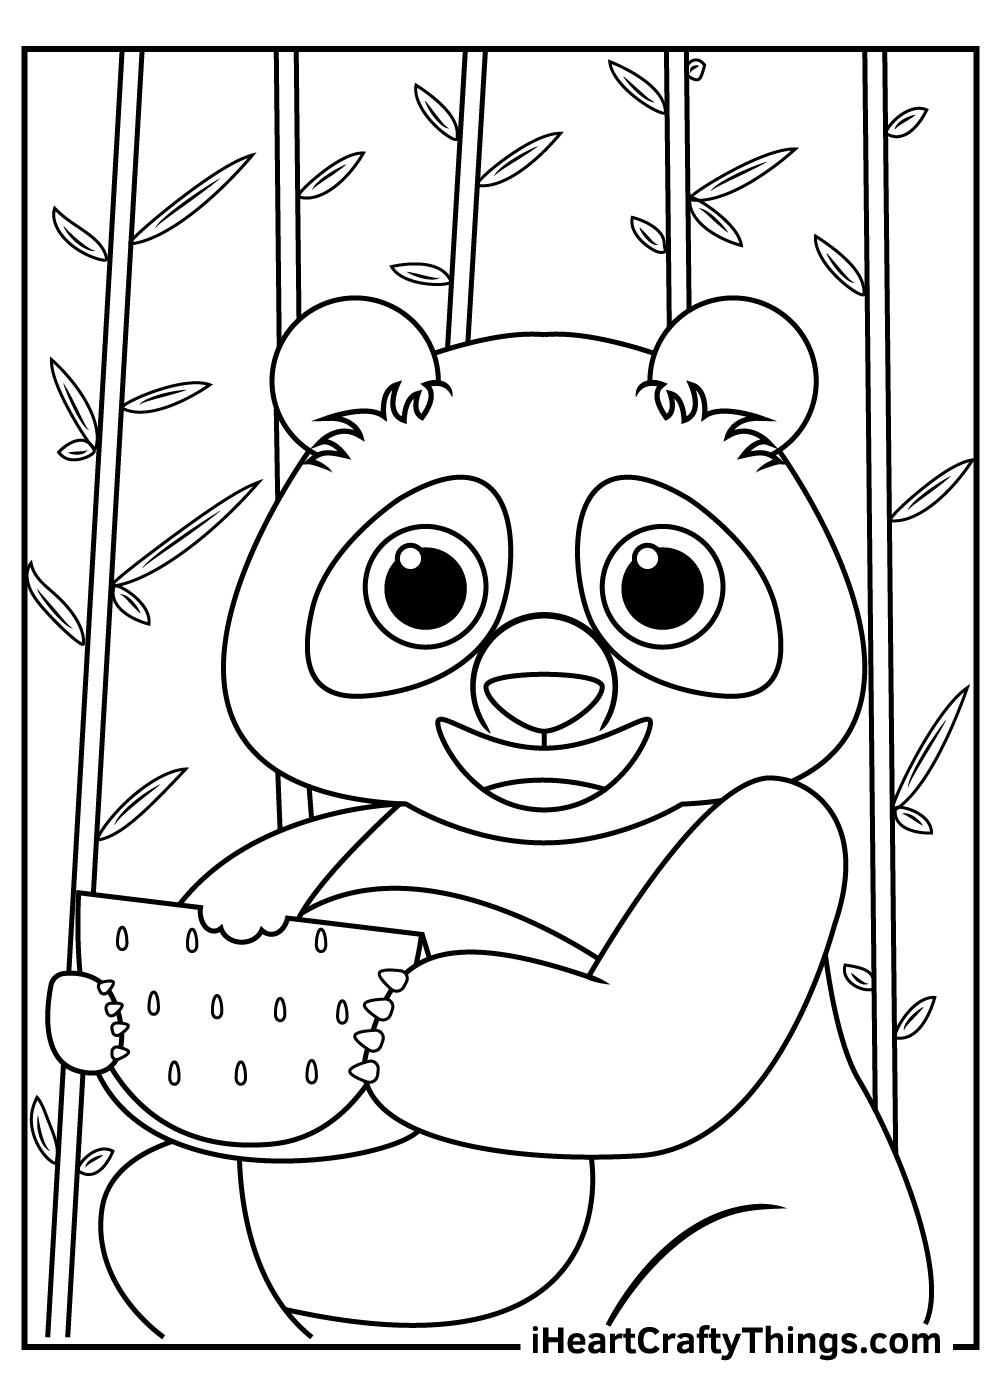 free pdf giant panda coloring pages